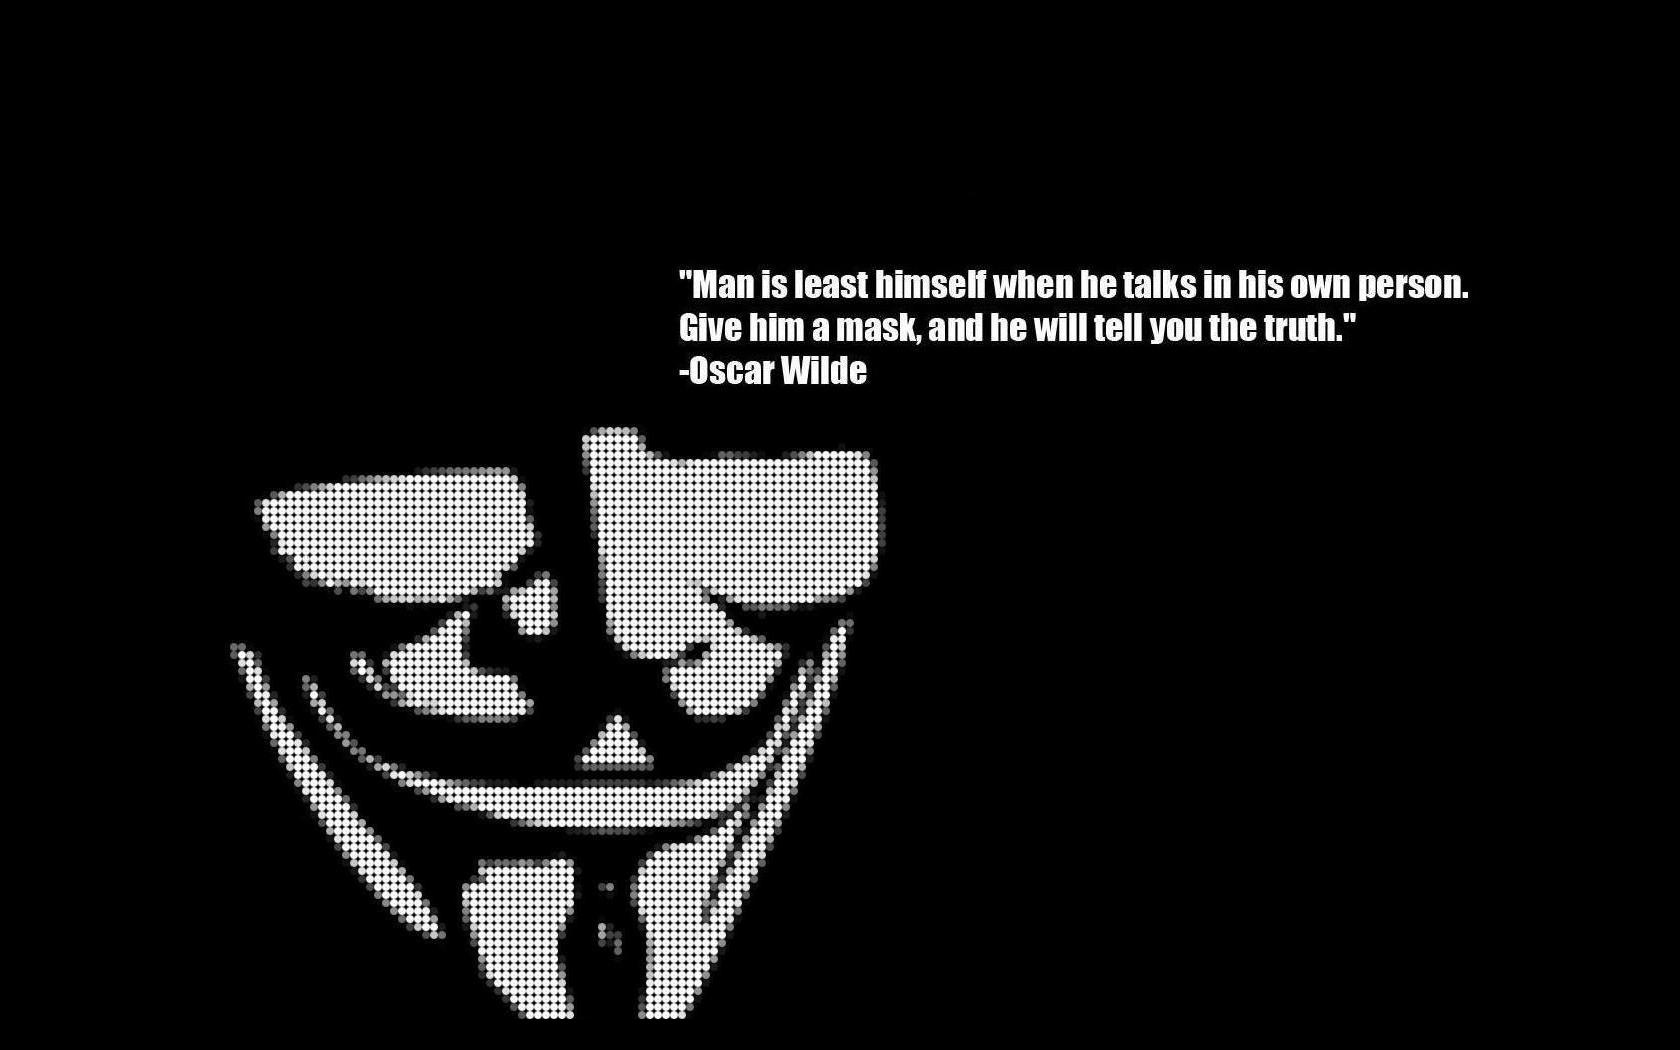 Deluxe V for Vendetta mask unboxing 30 one